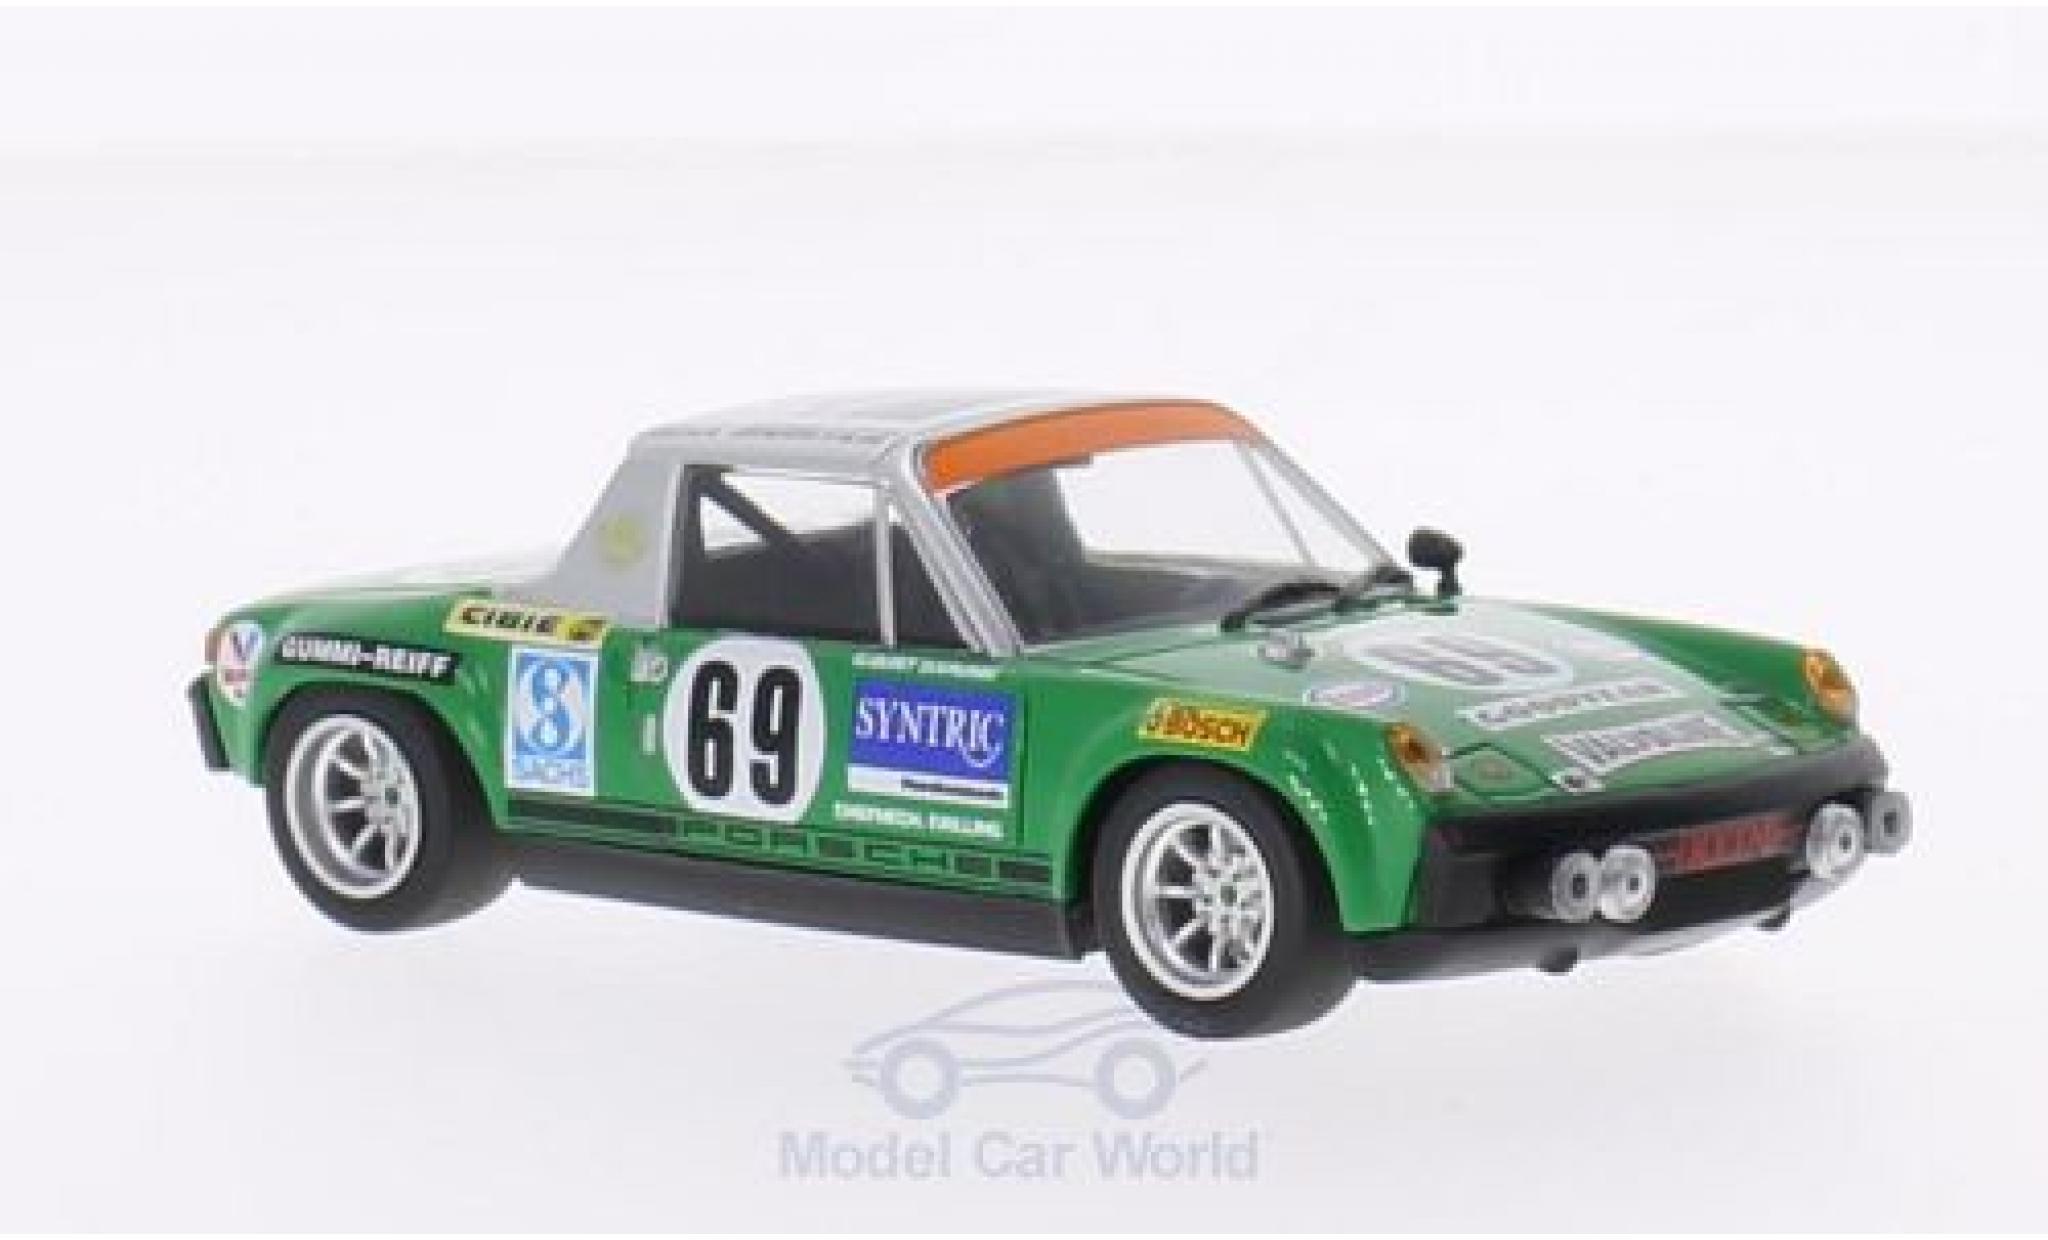 Porsche 914 1/43 Minichamps /6 No.69 Max Moritz Racing 24h Le Mans 1971 G.Quist/D.Krumm